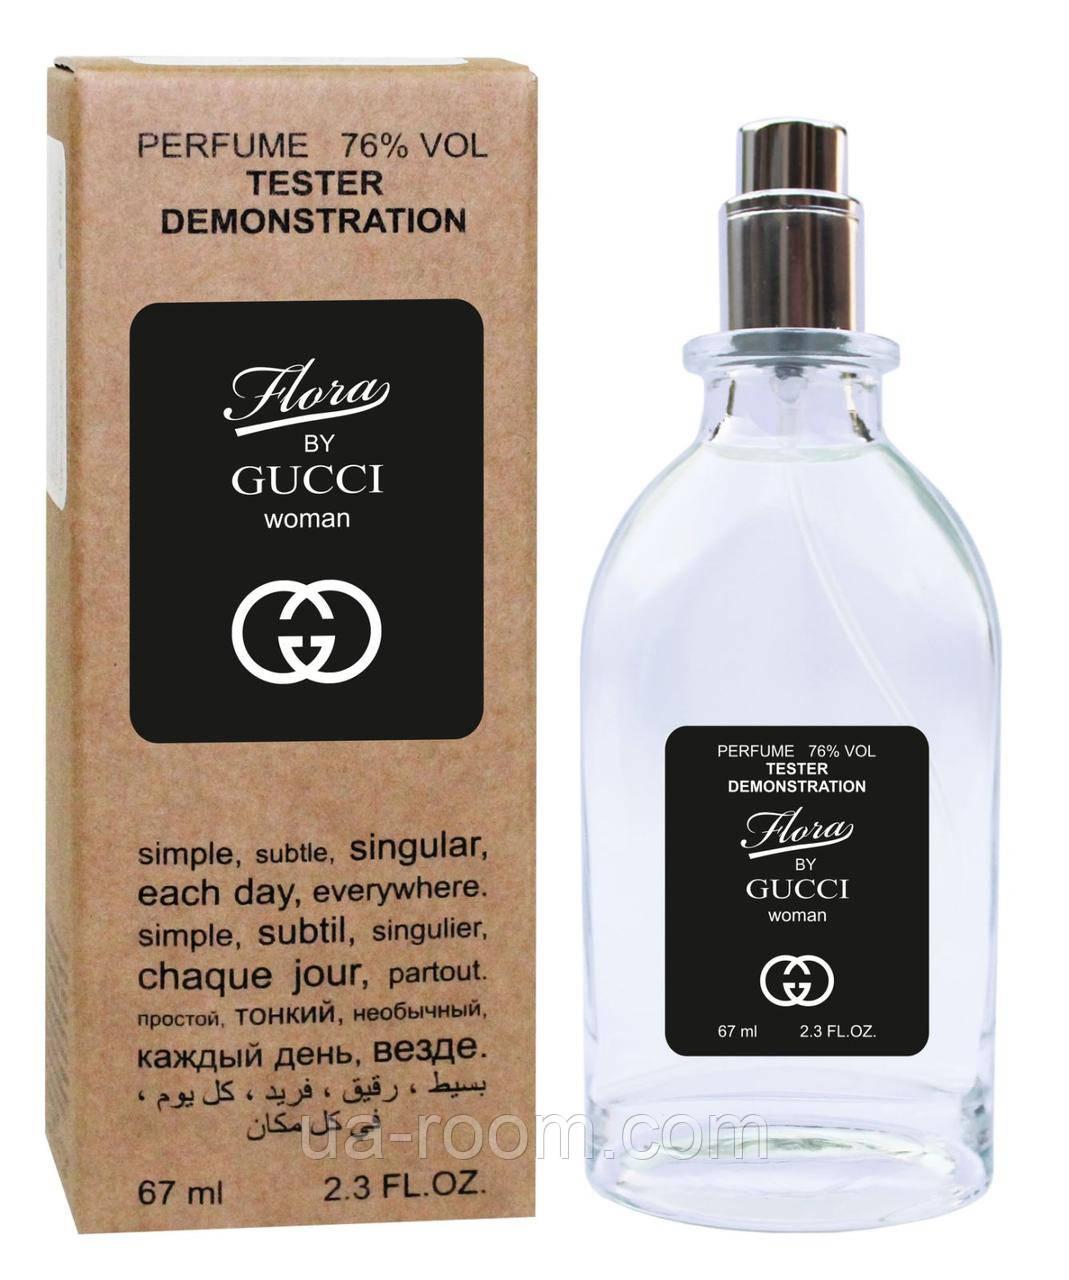 Тестер женский  Gucci Flora, 67 мл.